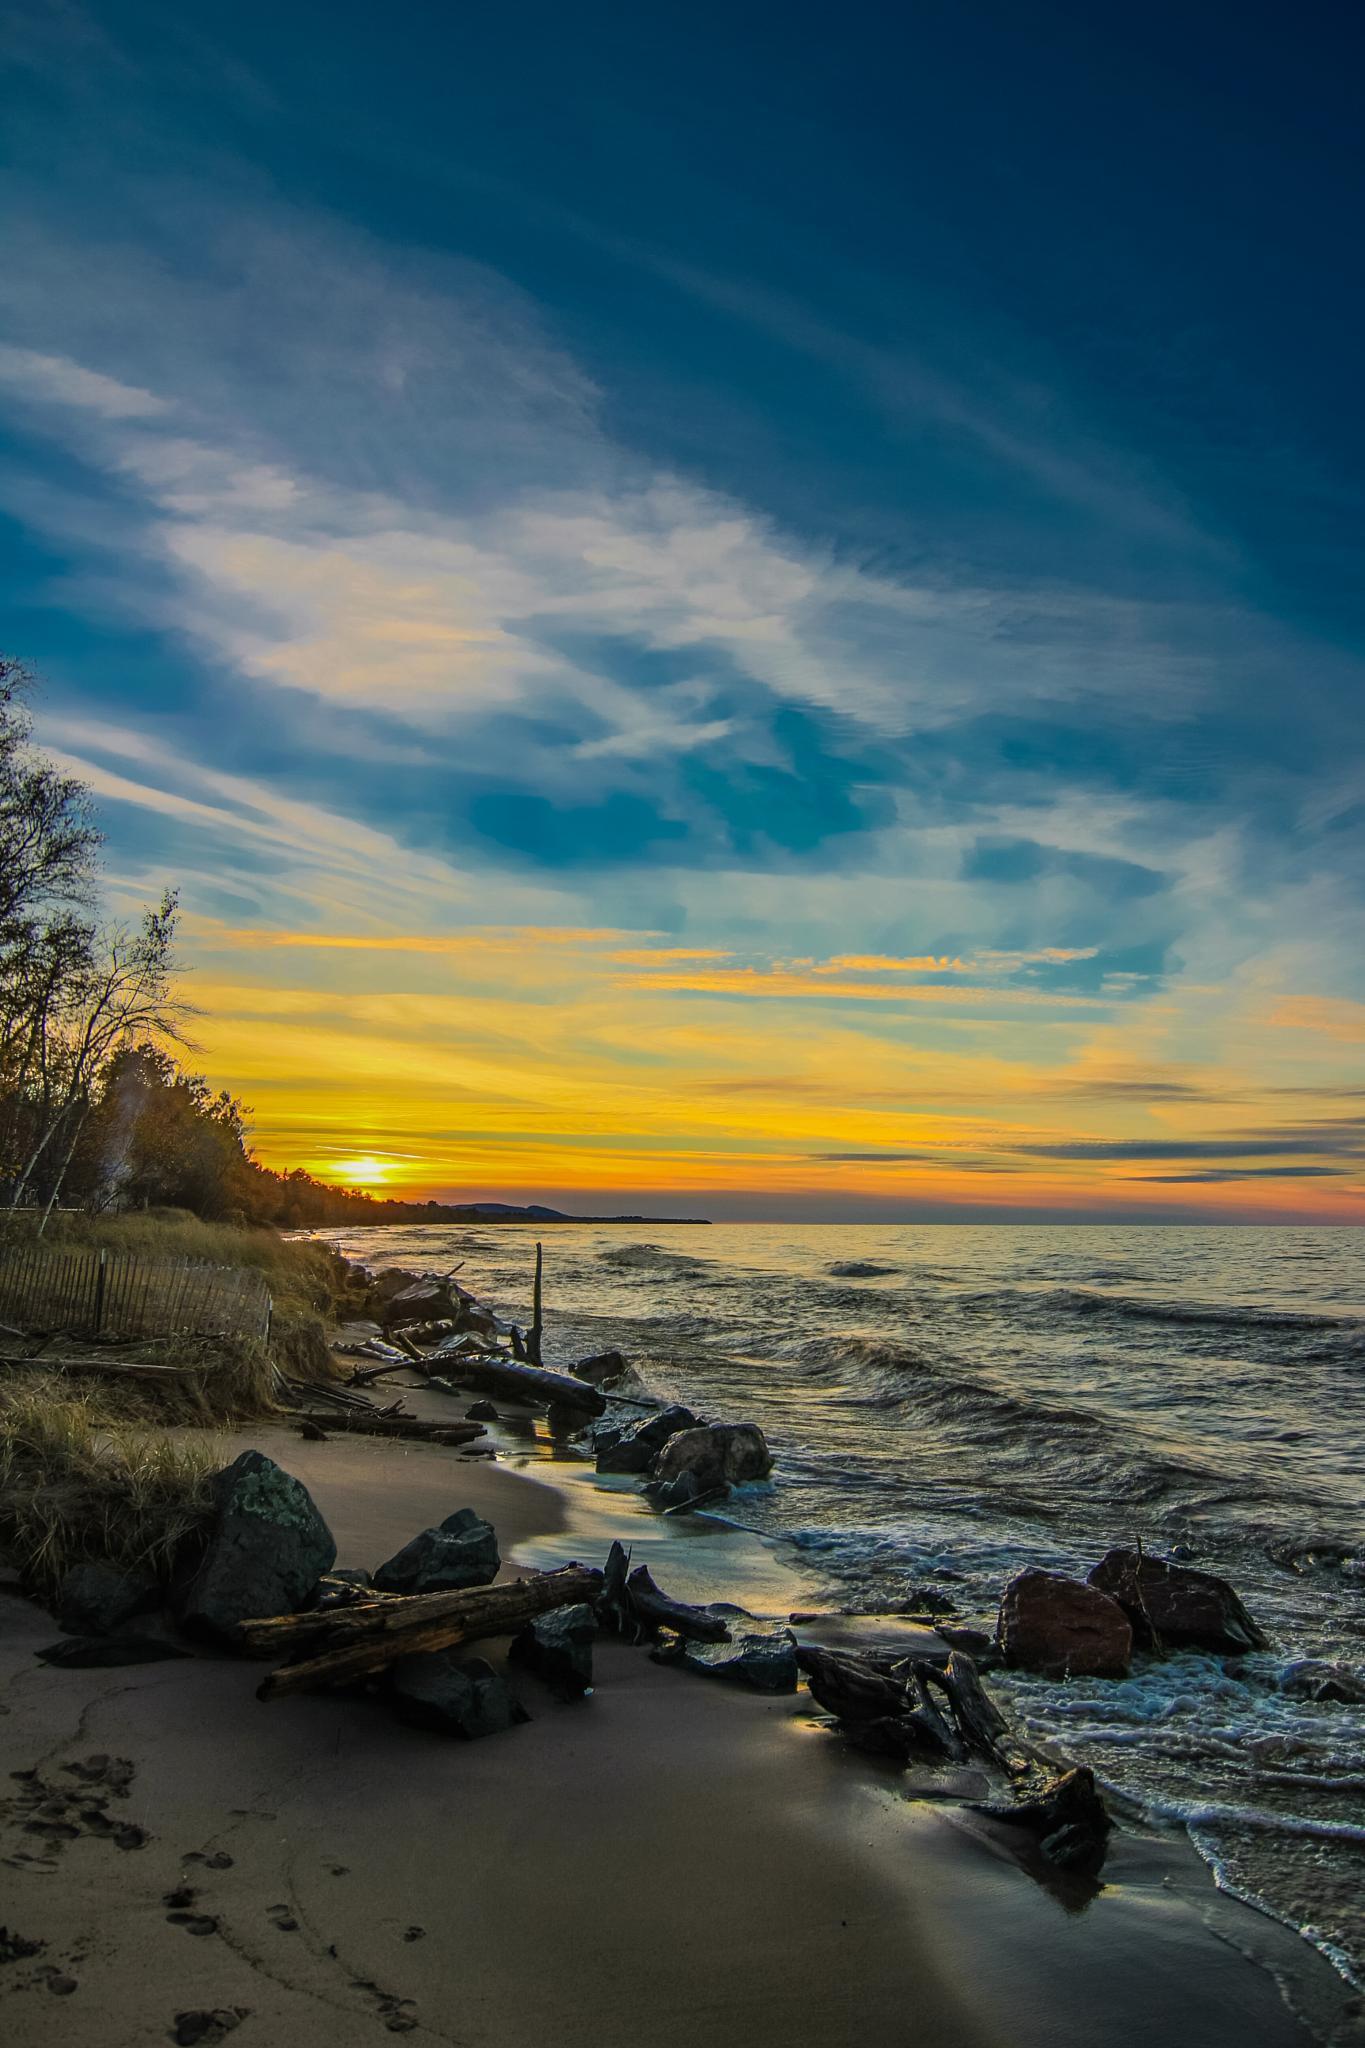 Sunset on Superior by Luke Johnson